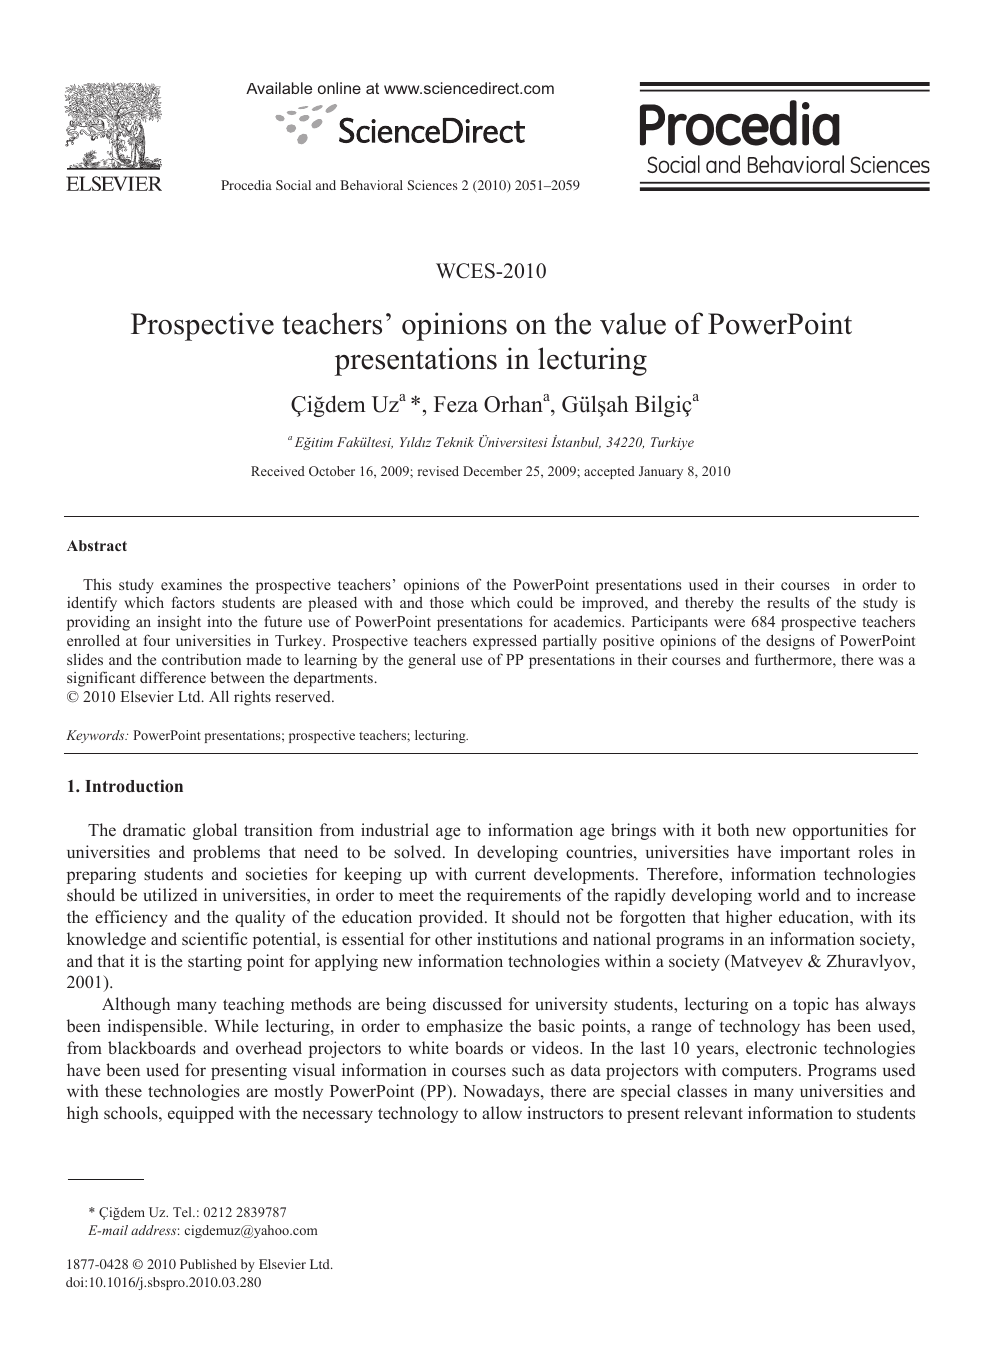 Prospective teachers' opinions on the value of PowerPoint